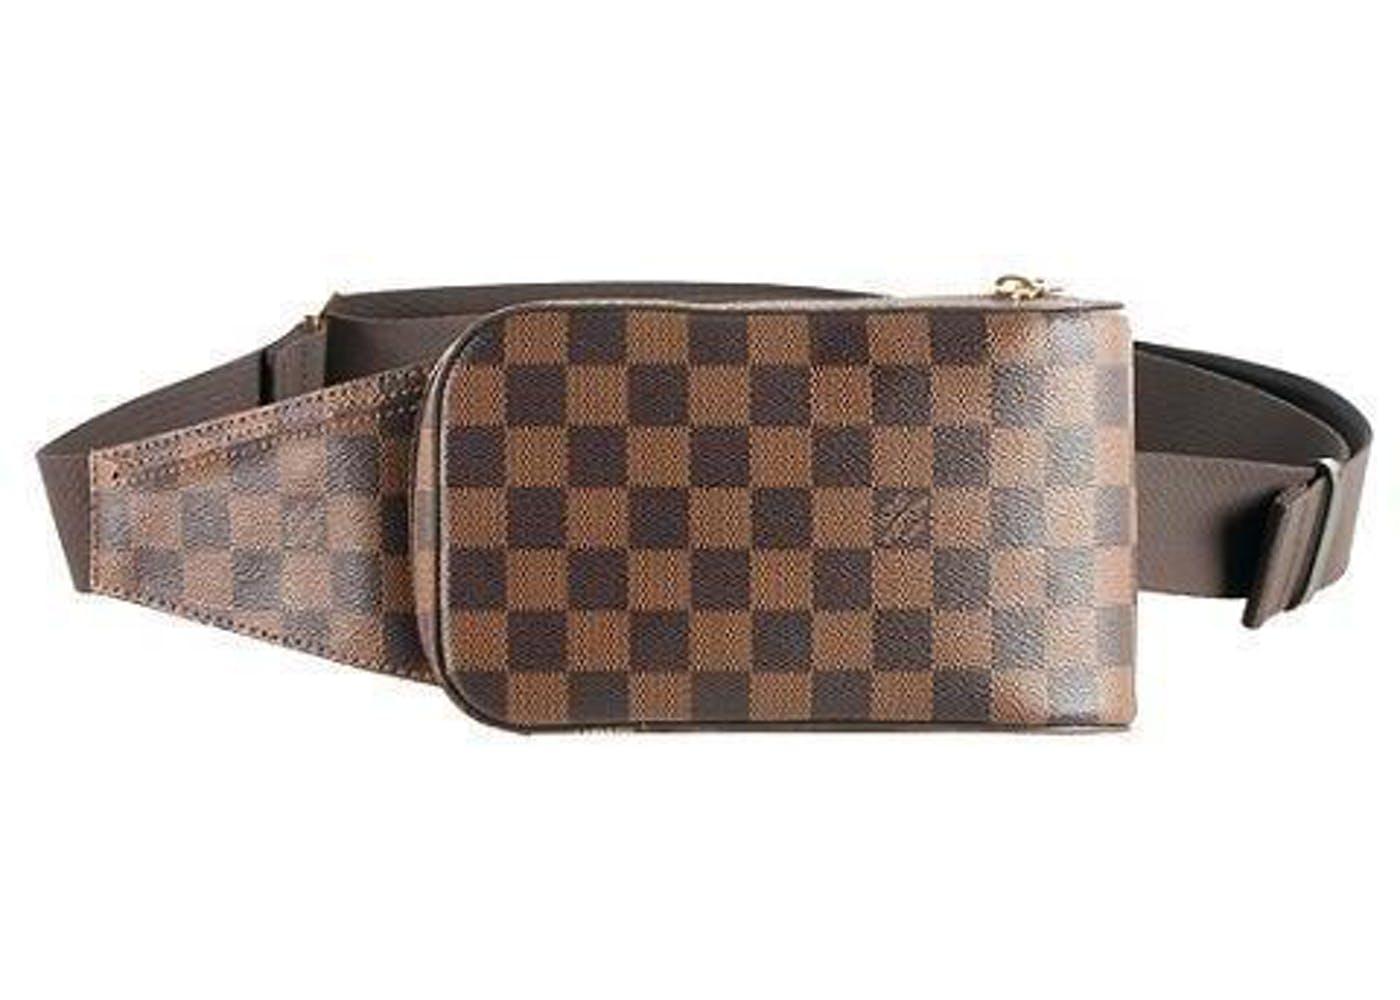 Louis-Vuitton-Geronimos-Damier-Ebene-Brown.jpg